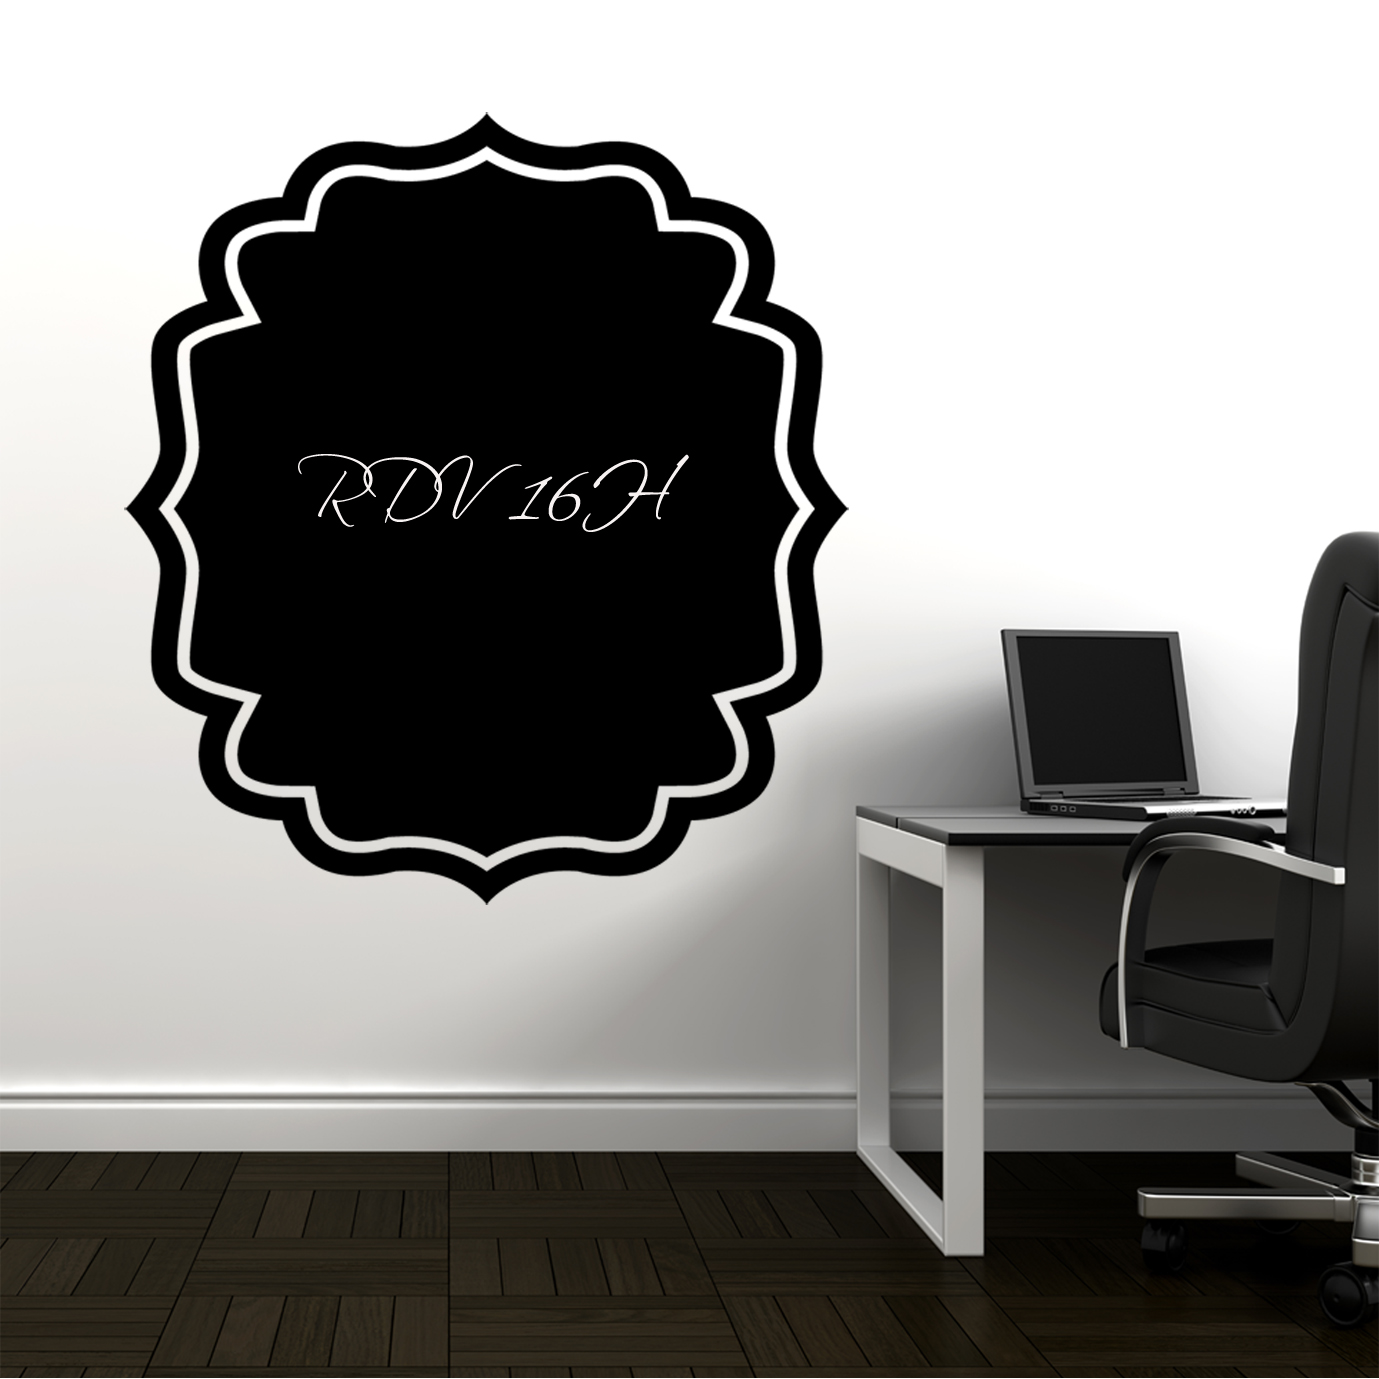 stickers ardoise cadre pas cher. Black Bedroom Furniture Sets. Home Design Ideas